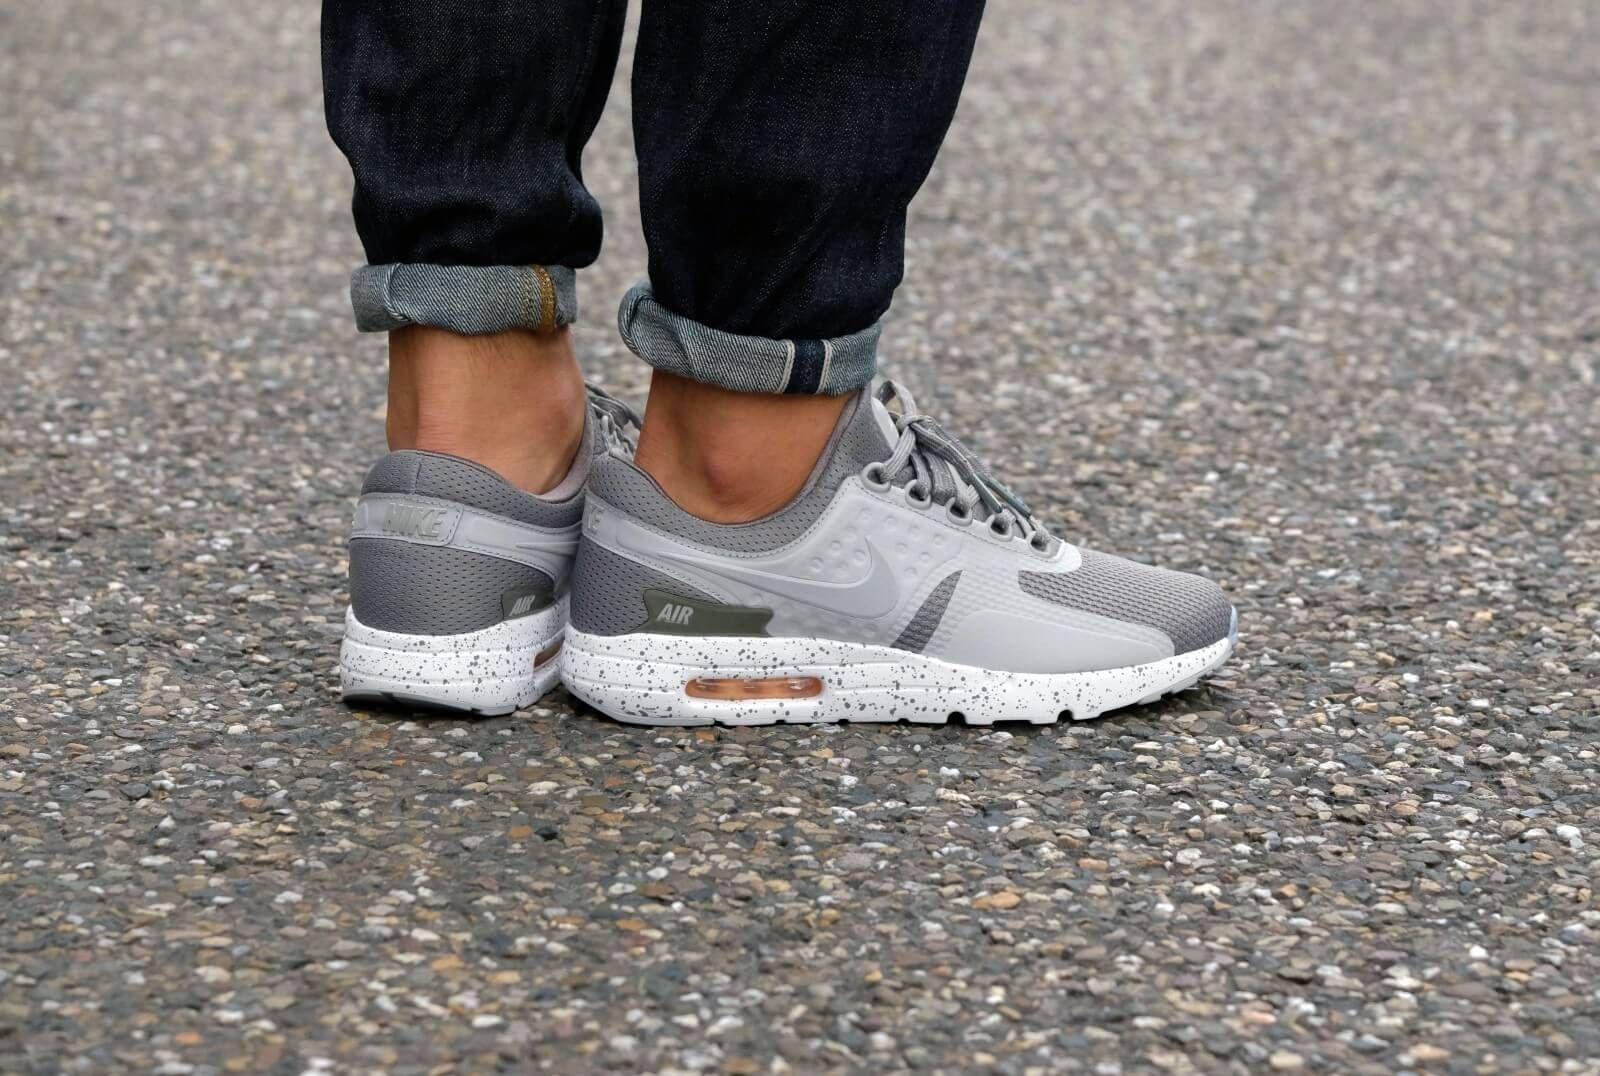 f45e6f394ed2 Nike Air Max Zero PRM Tumbled Grey Wolf Grey-White-Melon Tint ...